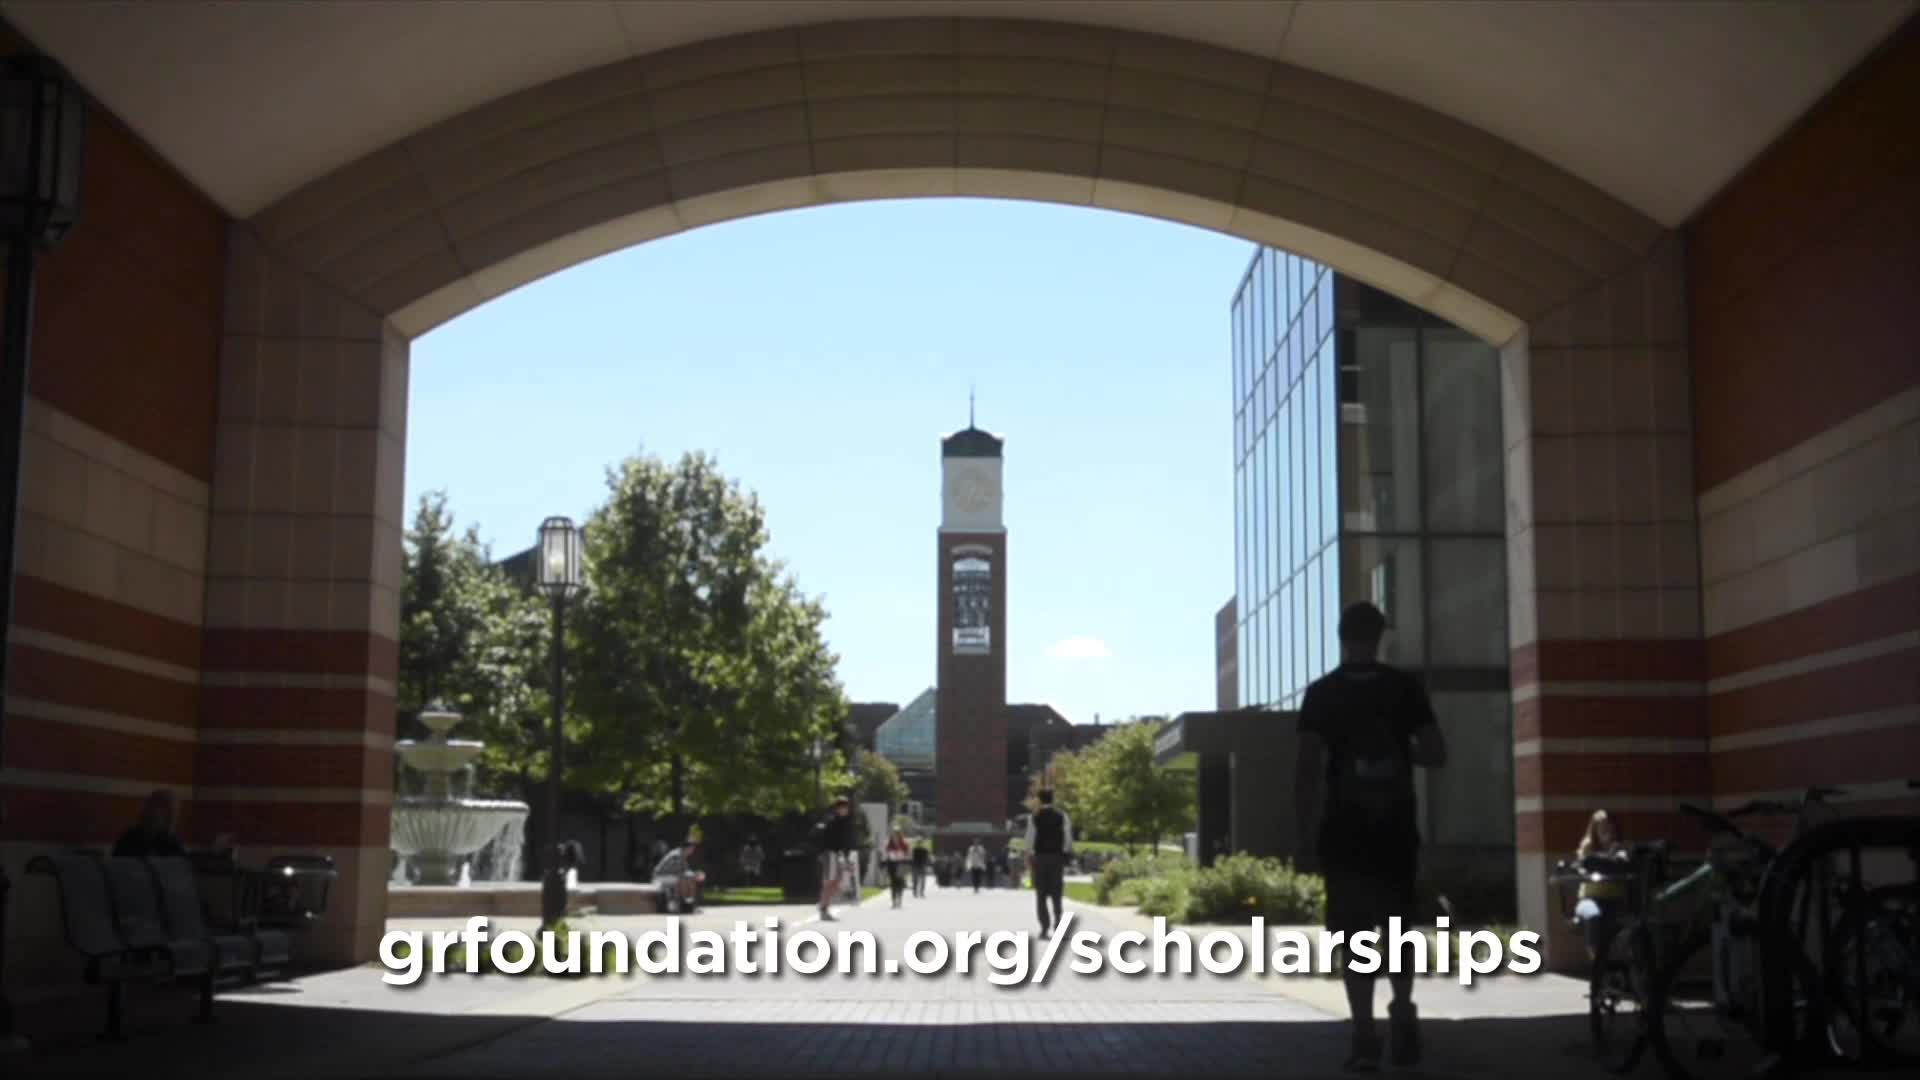 grcf-scholarship-season-2017_278125